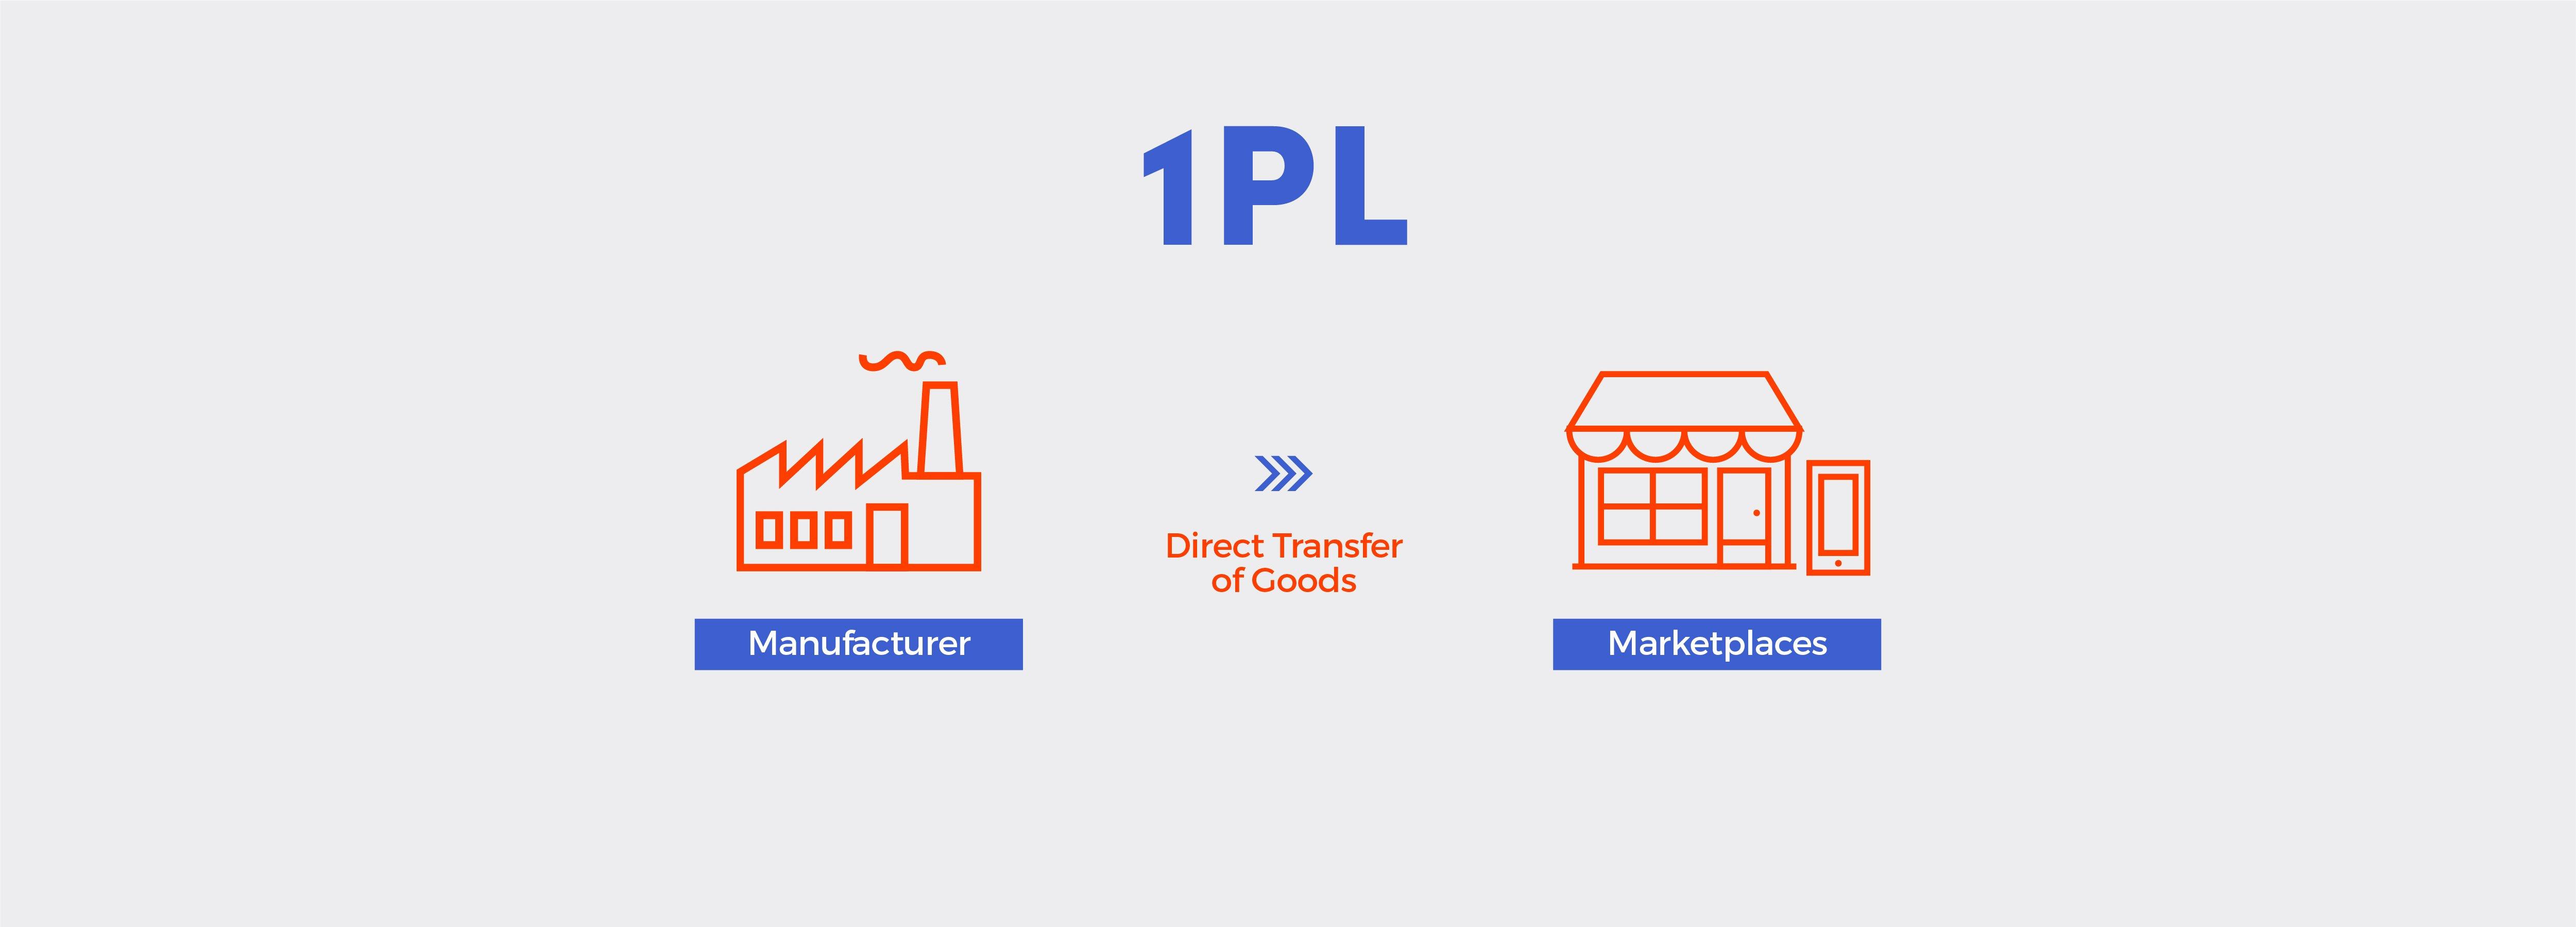 A 1PL Supply Chain Flowchart